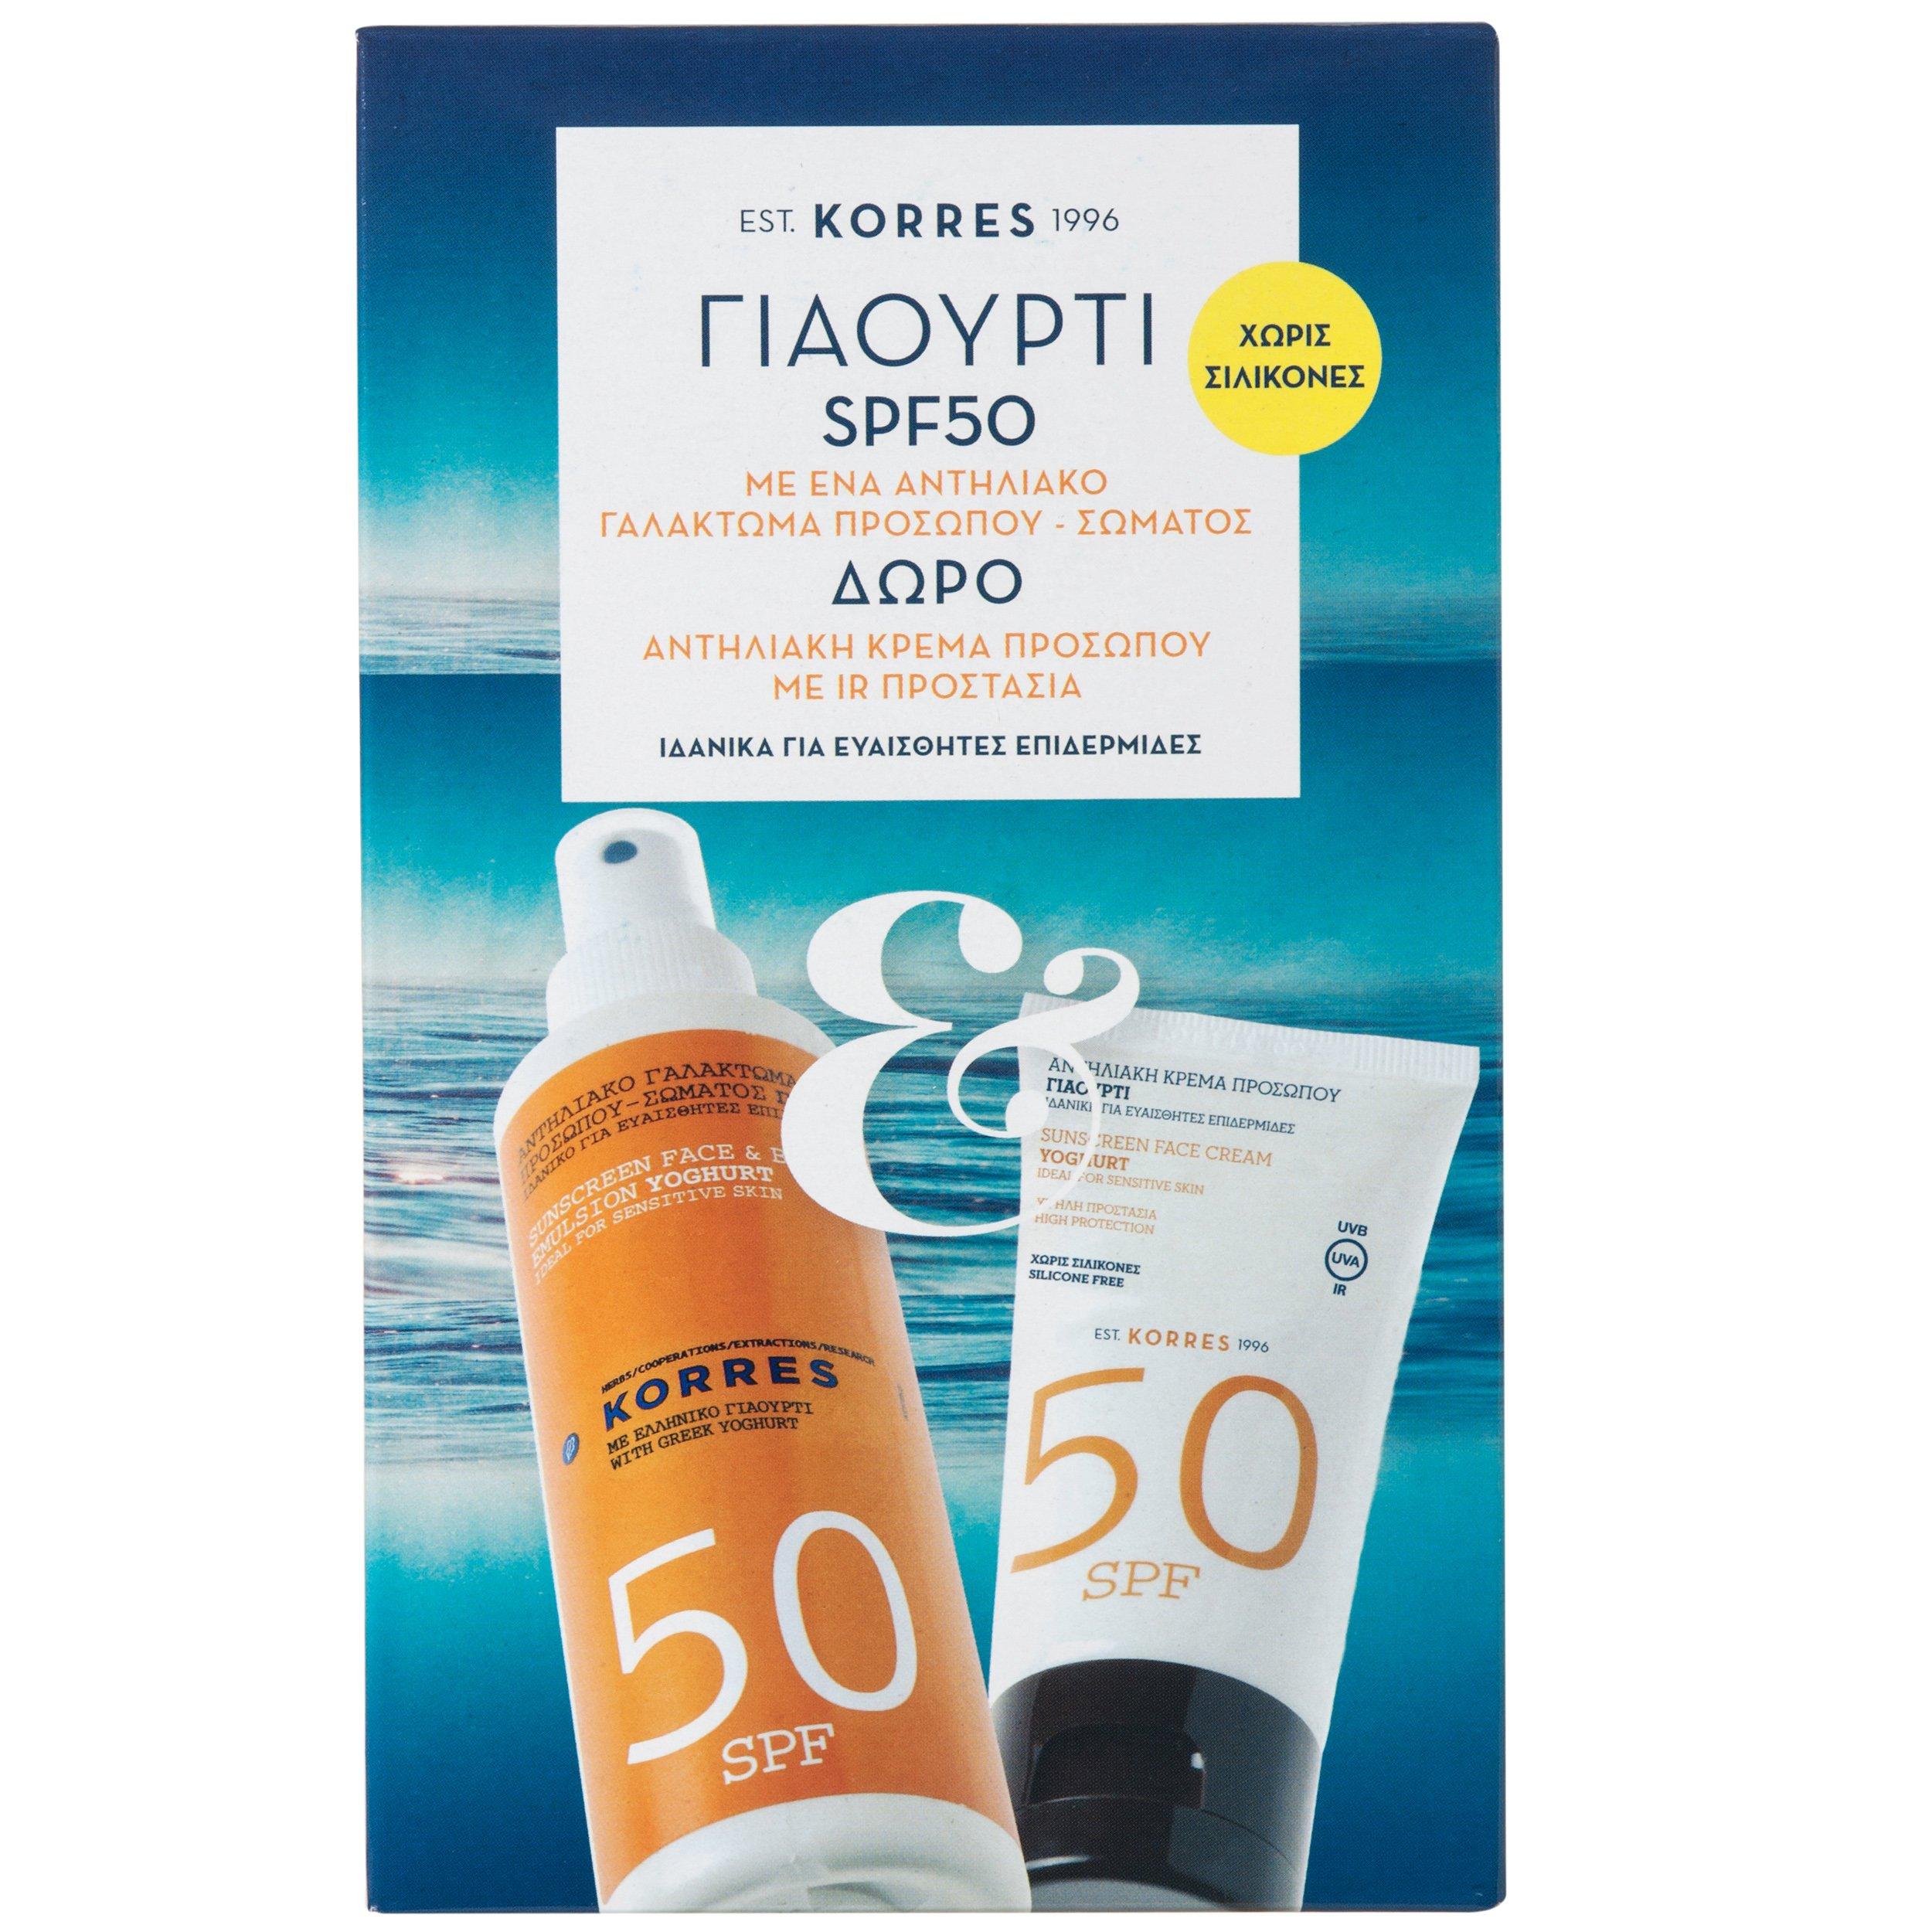 Korres Αντηλιακό Γαλάκτωμα Προσώπου-Σώματος Γιαούρτι Spf50 150ml&Δώρο Αντηλιακ αντηλιακά   αντηλιακά σώματος   υψηλή αντηλιακή προστασία σώματος